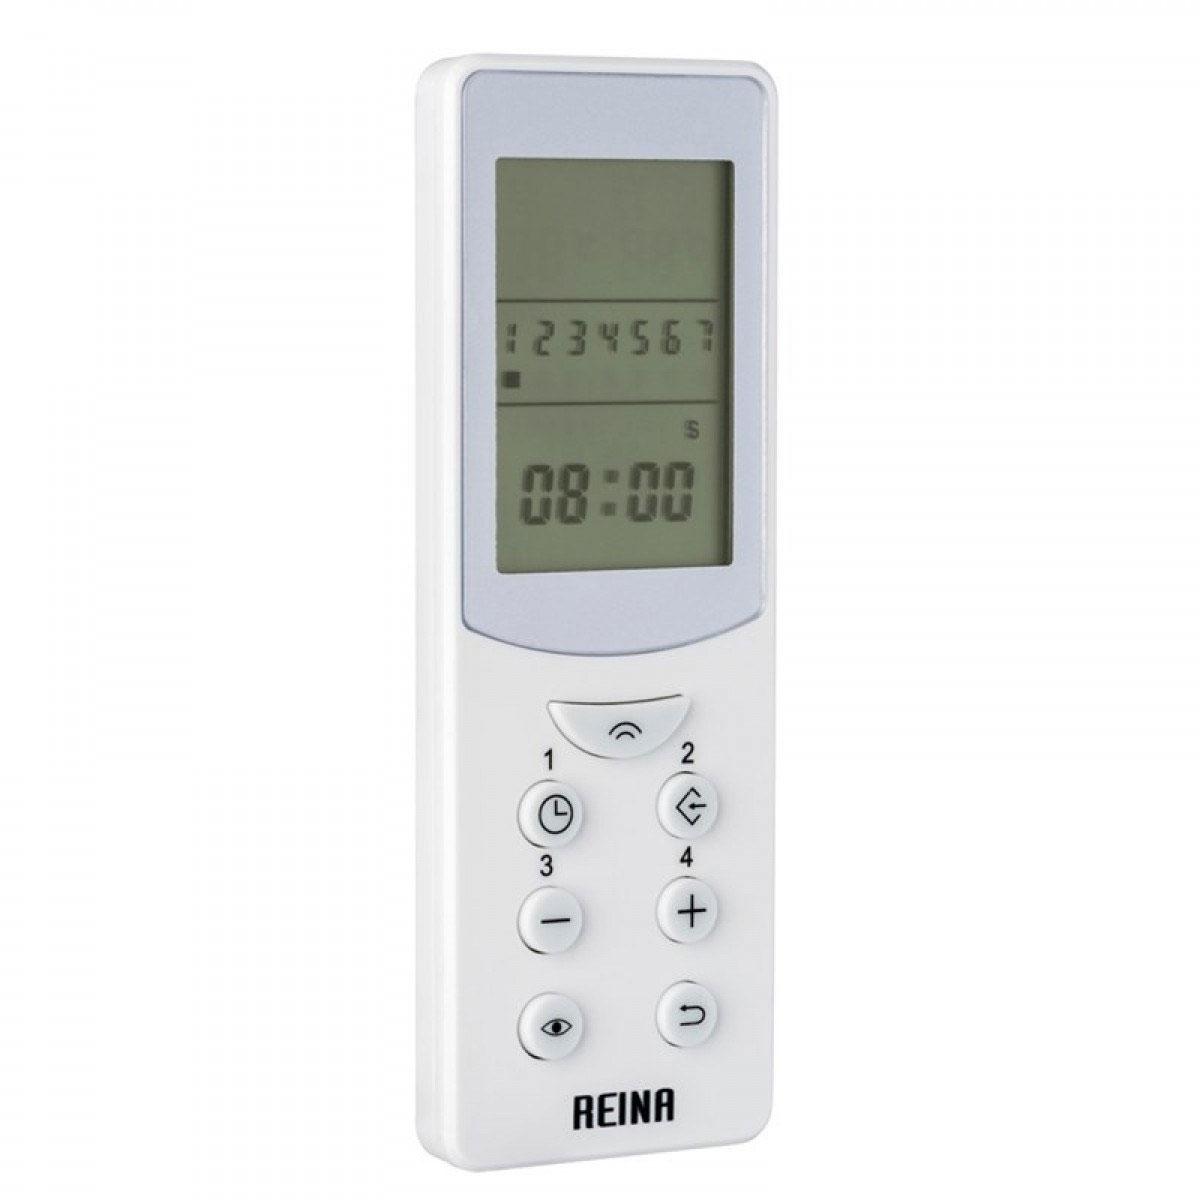 Reina Diva Thermostatic Electric Straight Heated Towel Rail 1600mm H x 500mm W Chrome-1